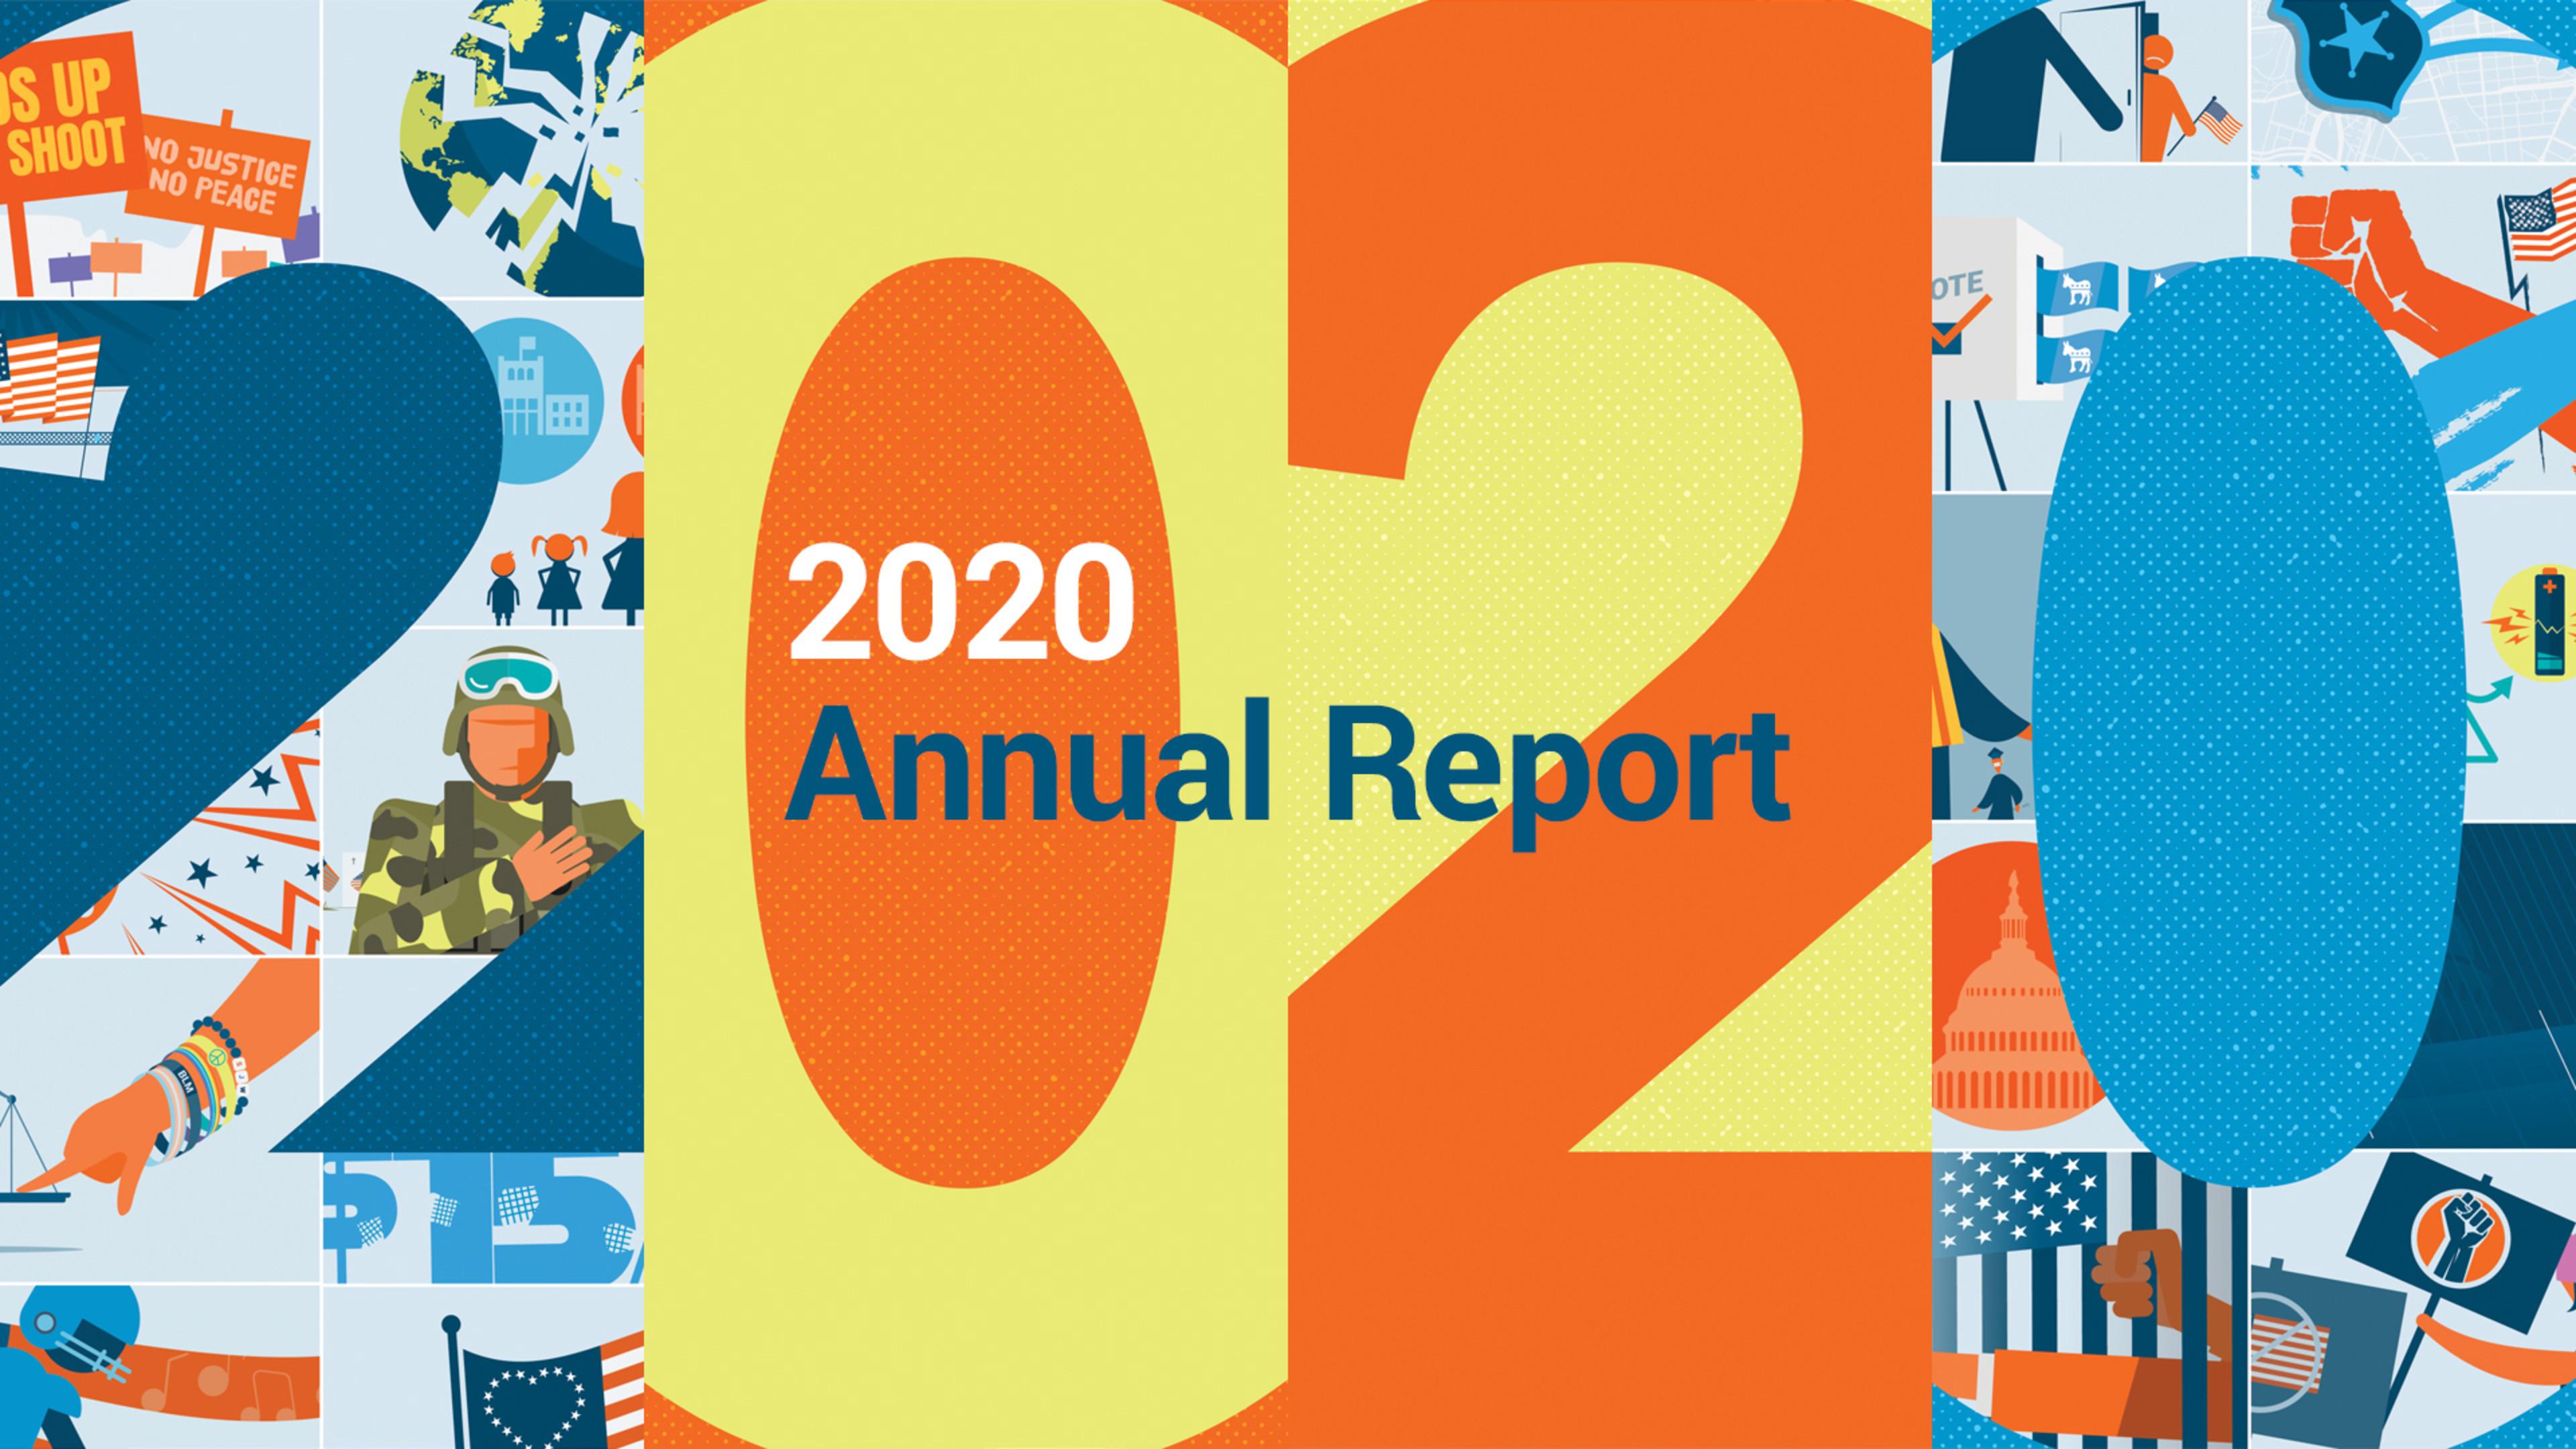 PragerU 2020AnnualReport WEB GRID THUMB